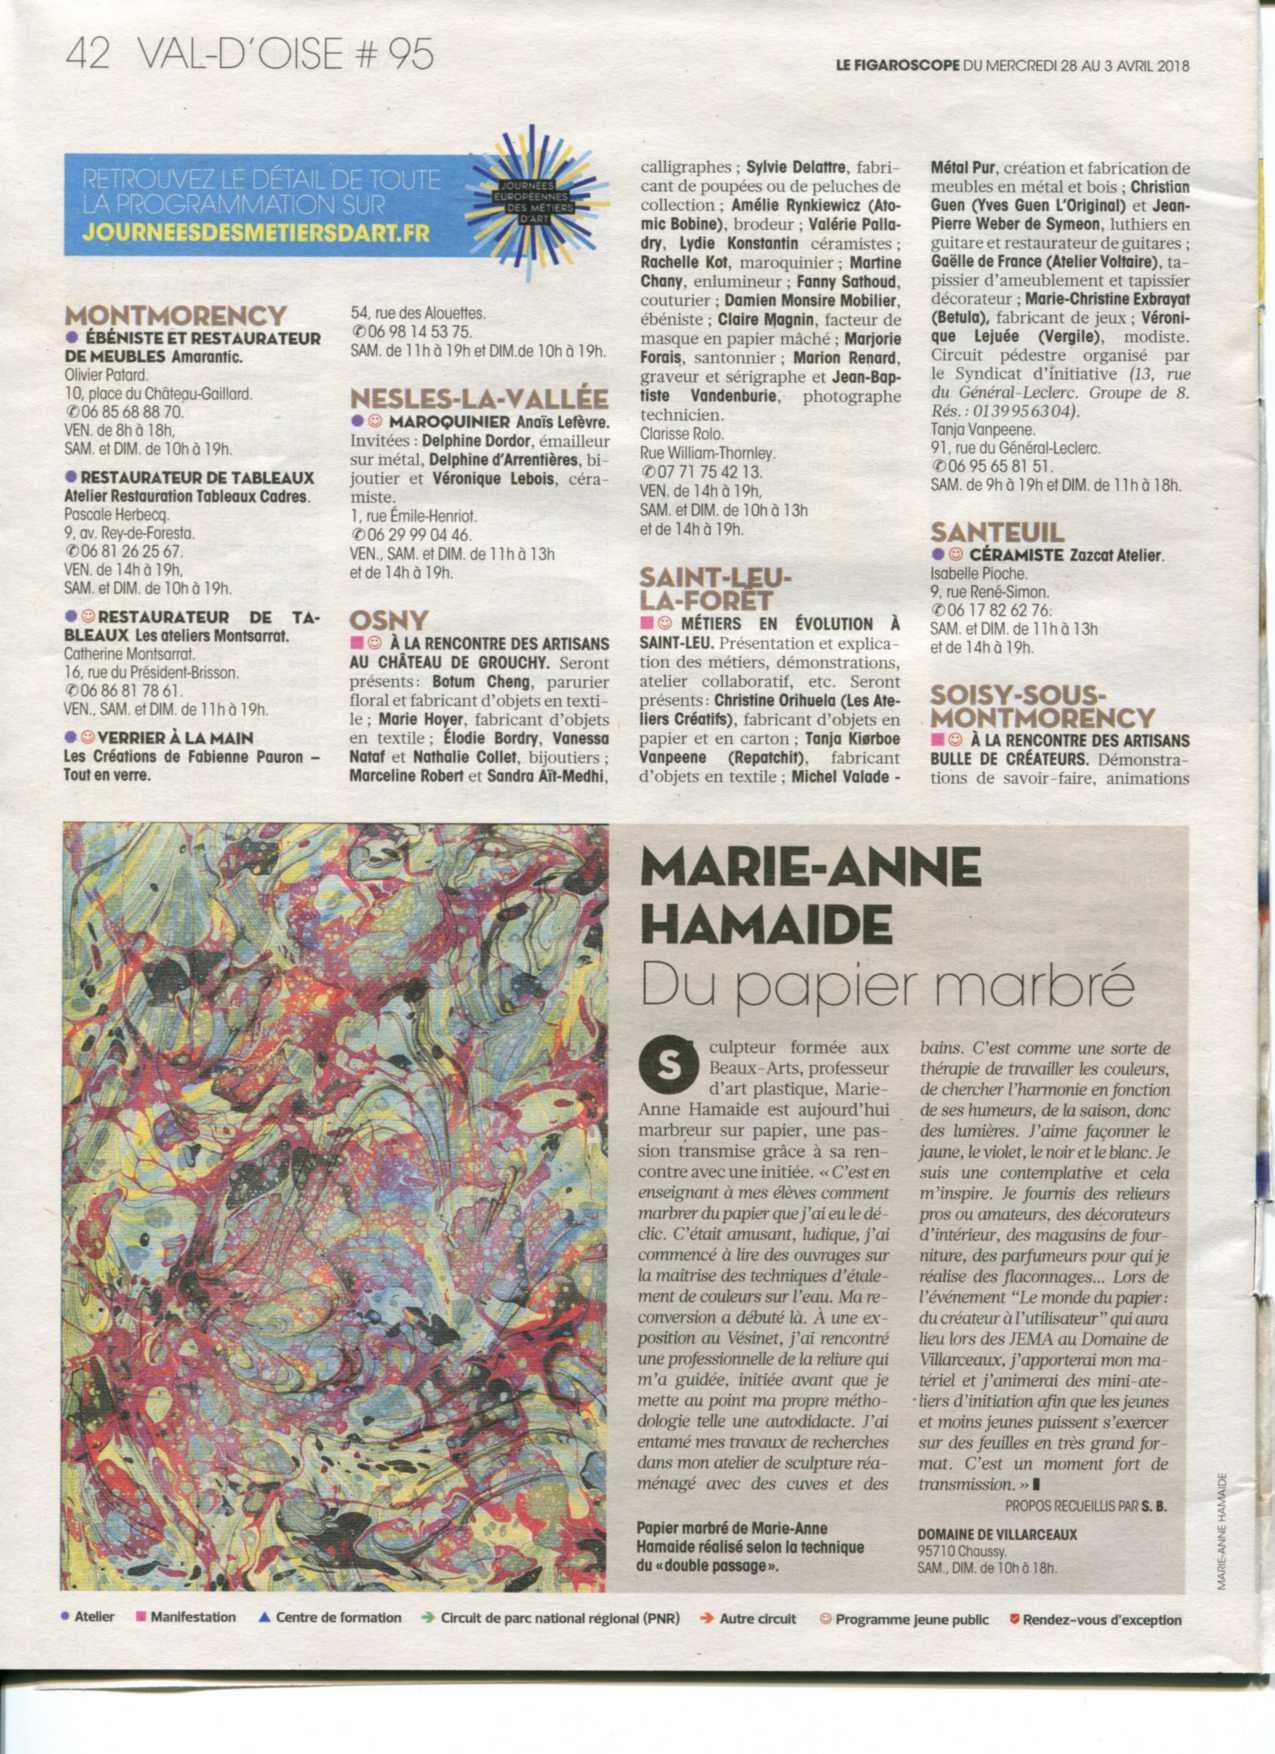 Article Figaroscope